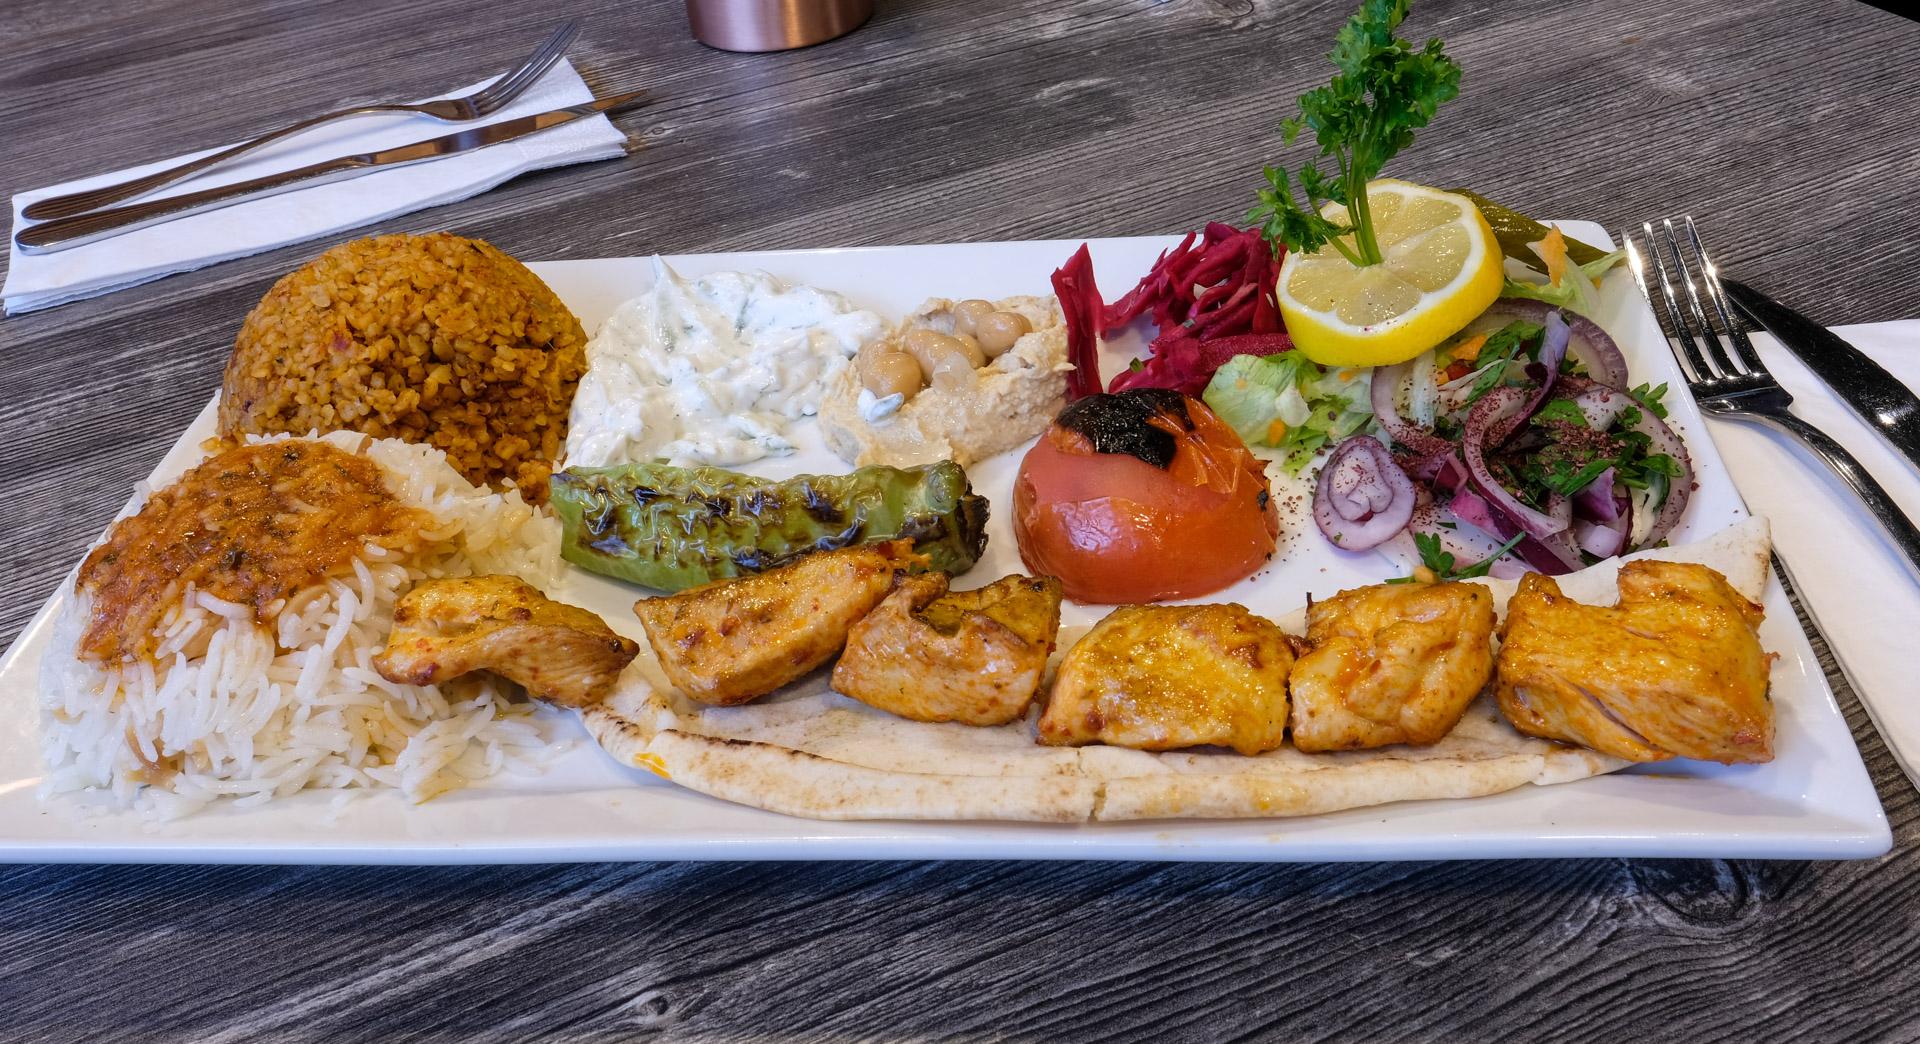 Restaurant Sultan Palads: Stor frokost fra kulgrillen til kun 59 kroner